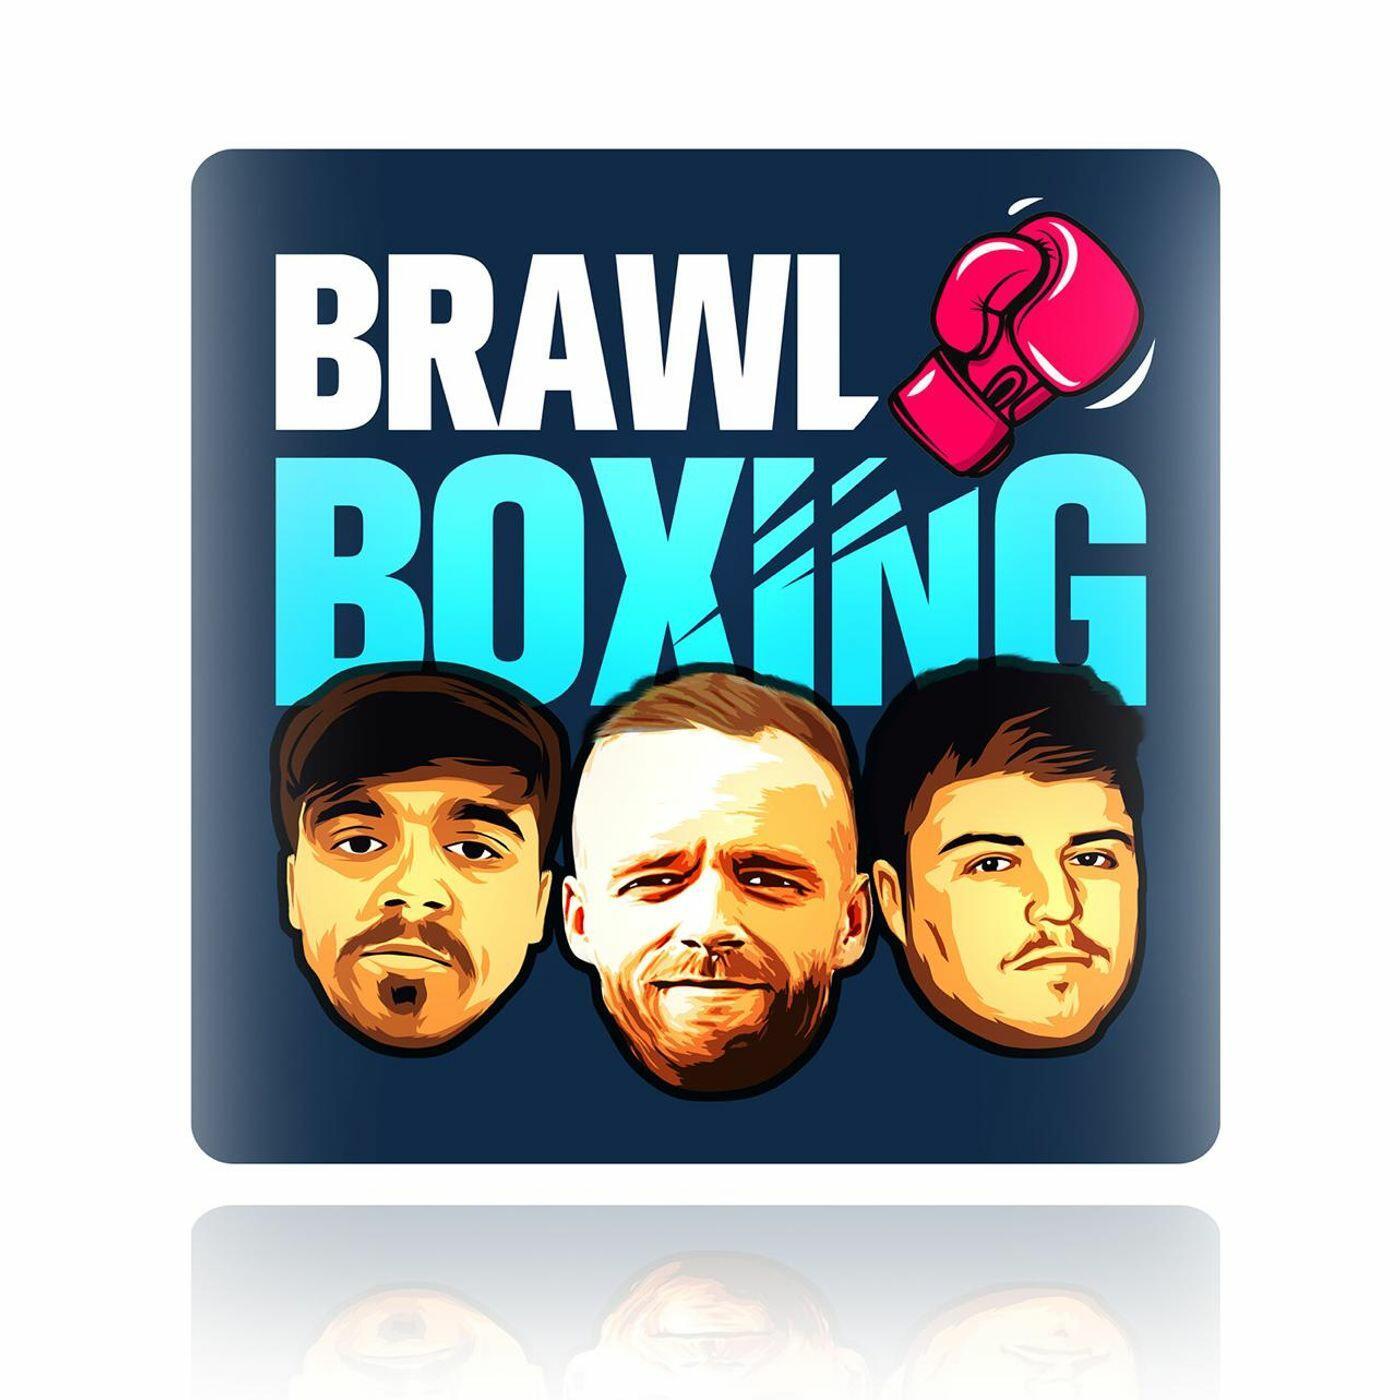 Brawl Boxing